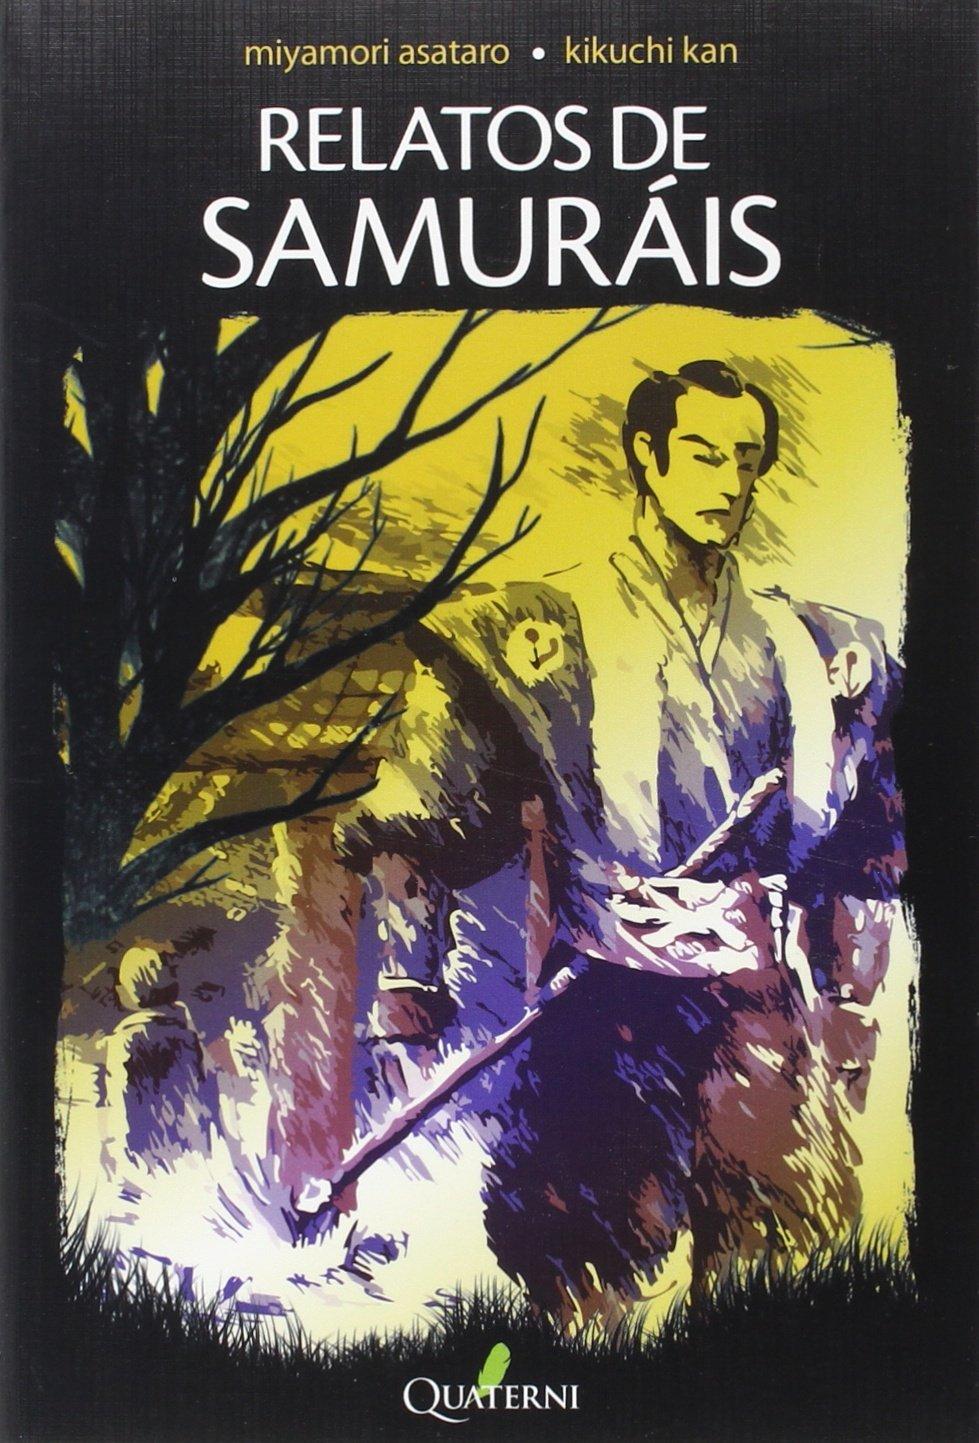 Relatos de Samuráis (Narrativa (quaterni)): Amazon.es: Asataro y Kikuchi, Kan Miyamori: Libros